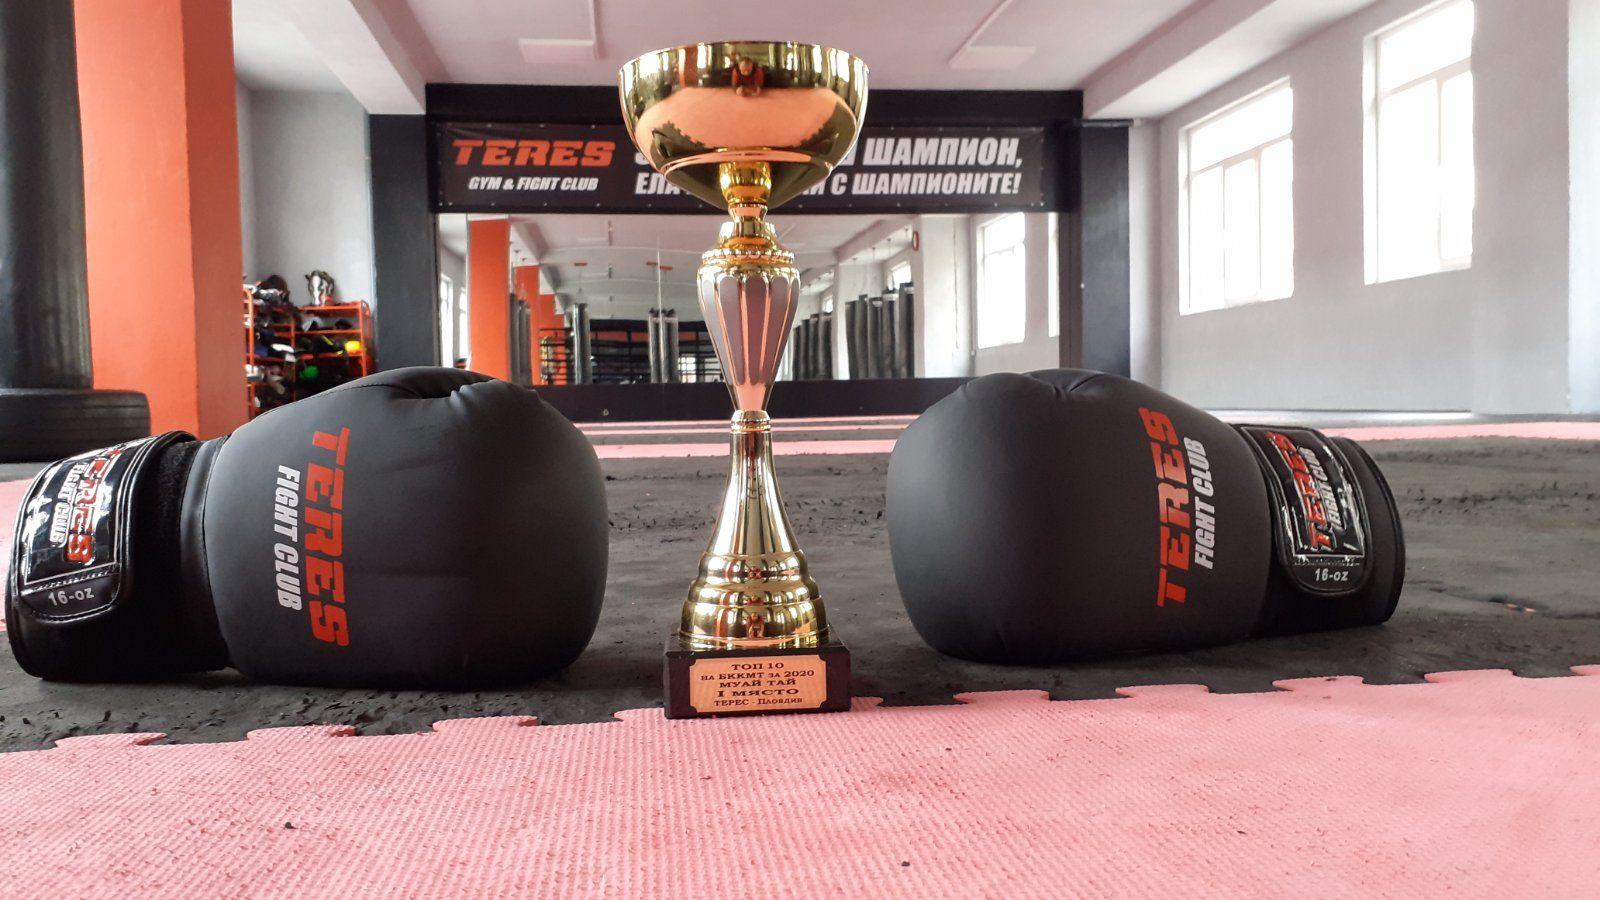 Купа отборен шампион терес, Пловдив 2020 муай тай